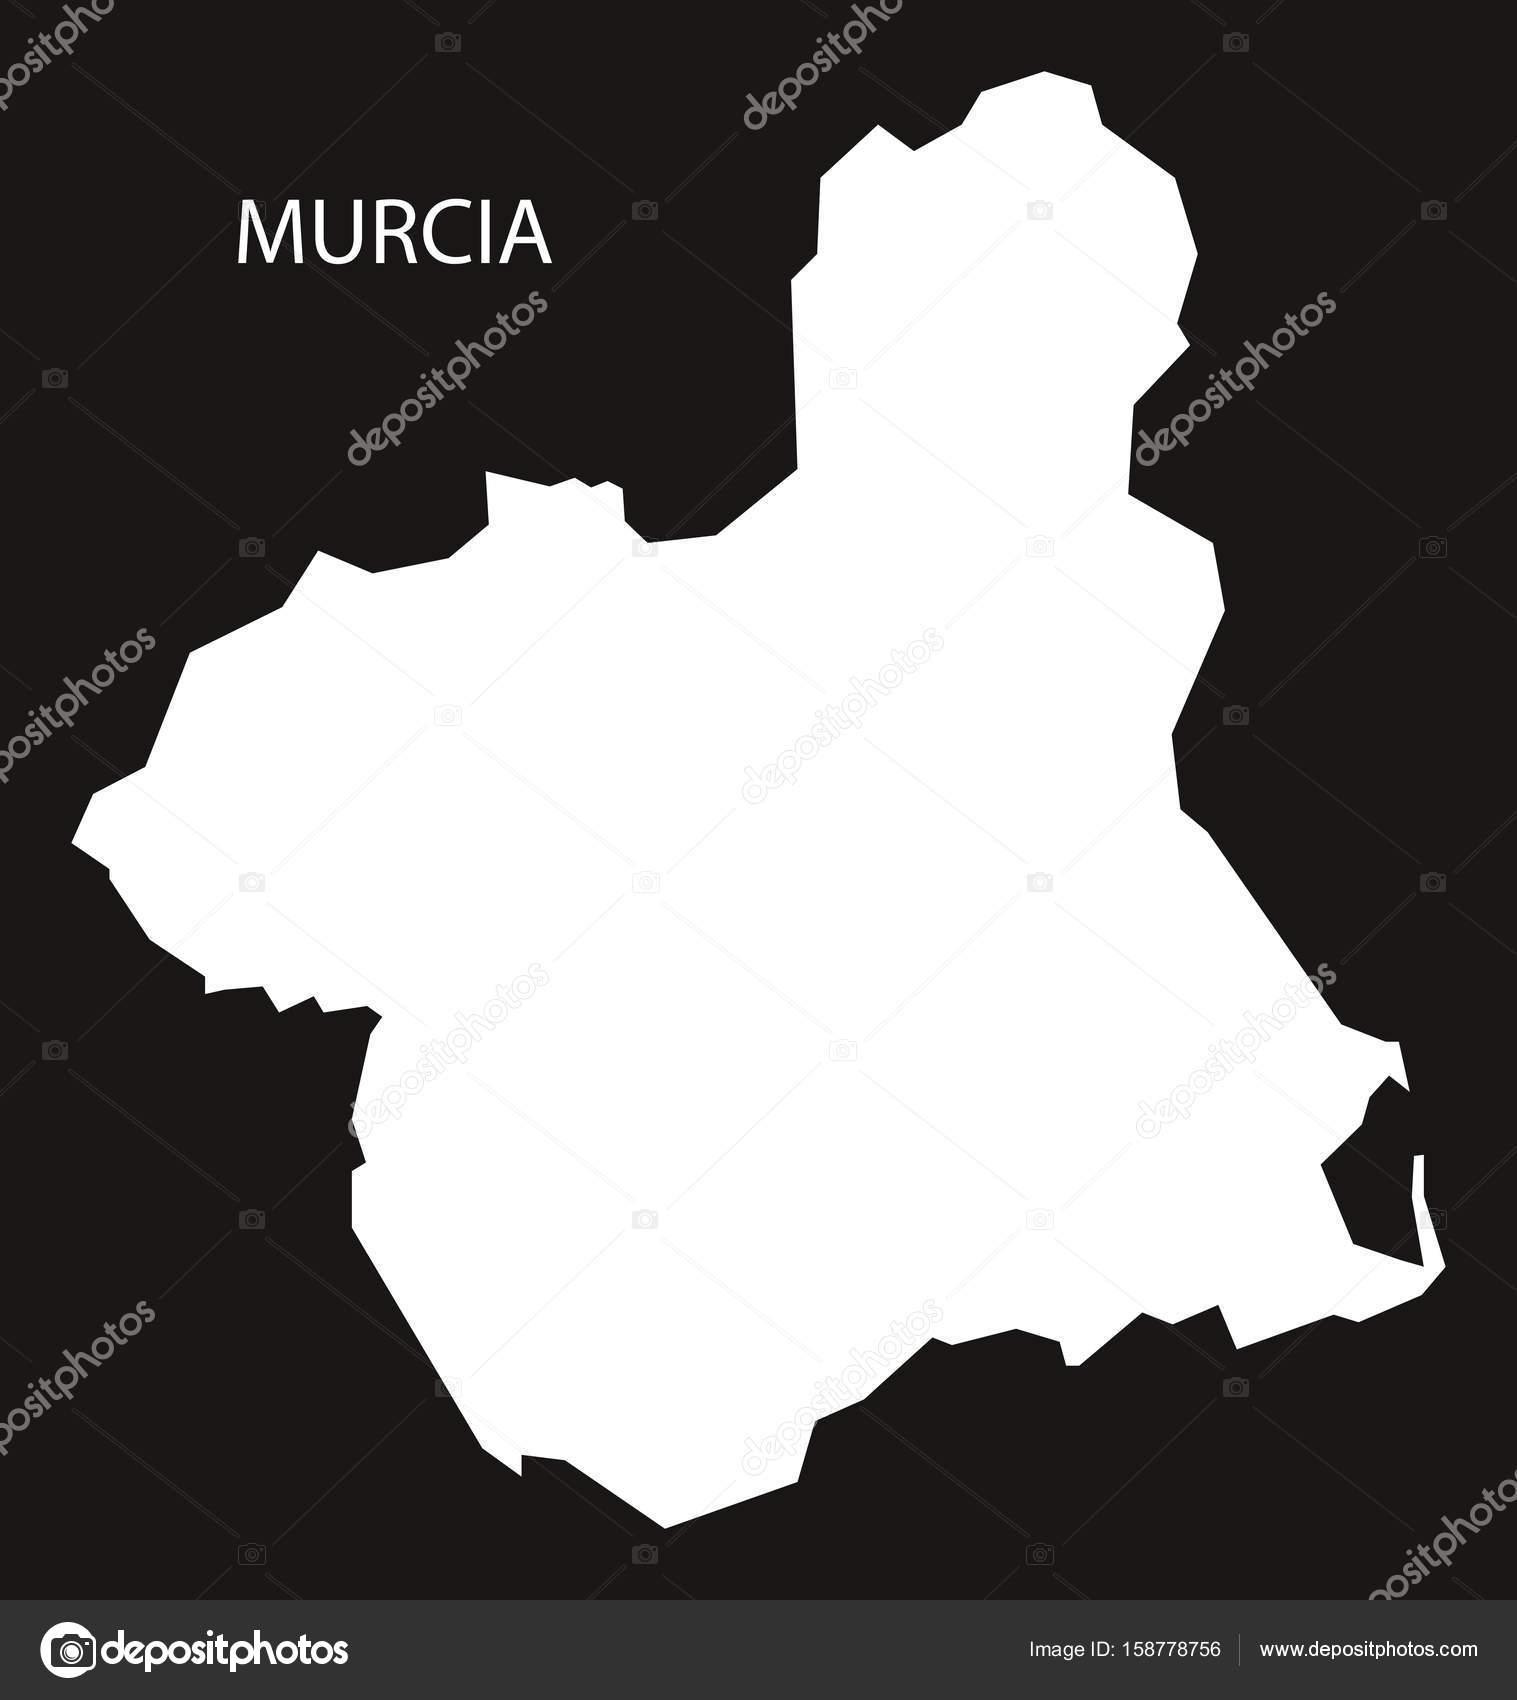 murcia karta Murcia Spanien karta svart inverterad siluett illustration — Stock  murcia karta